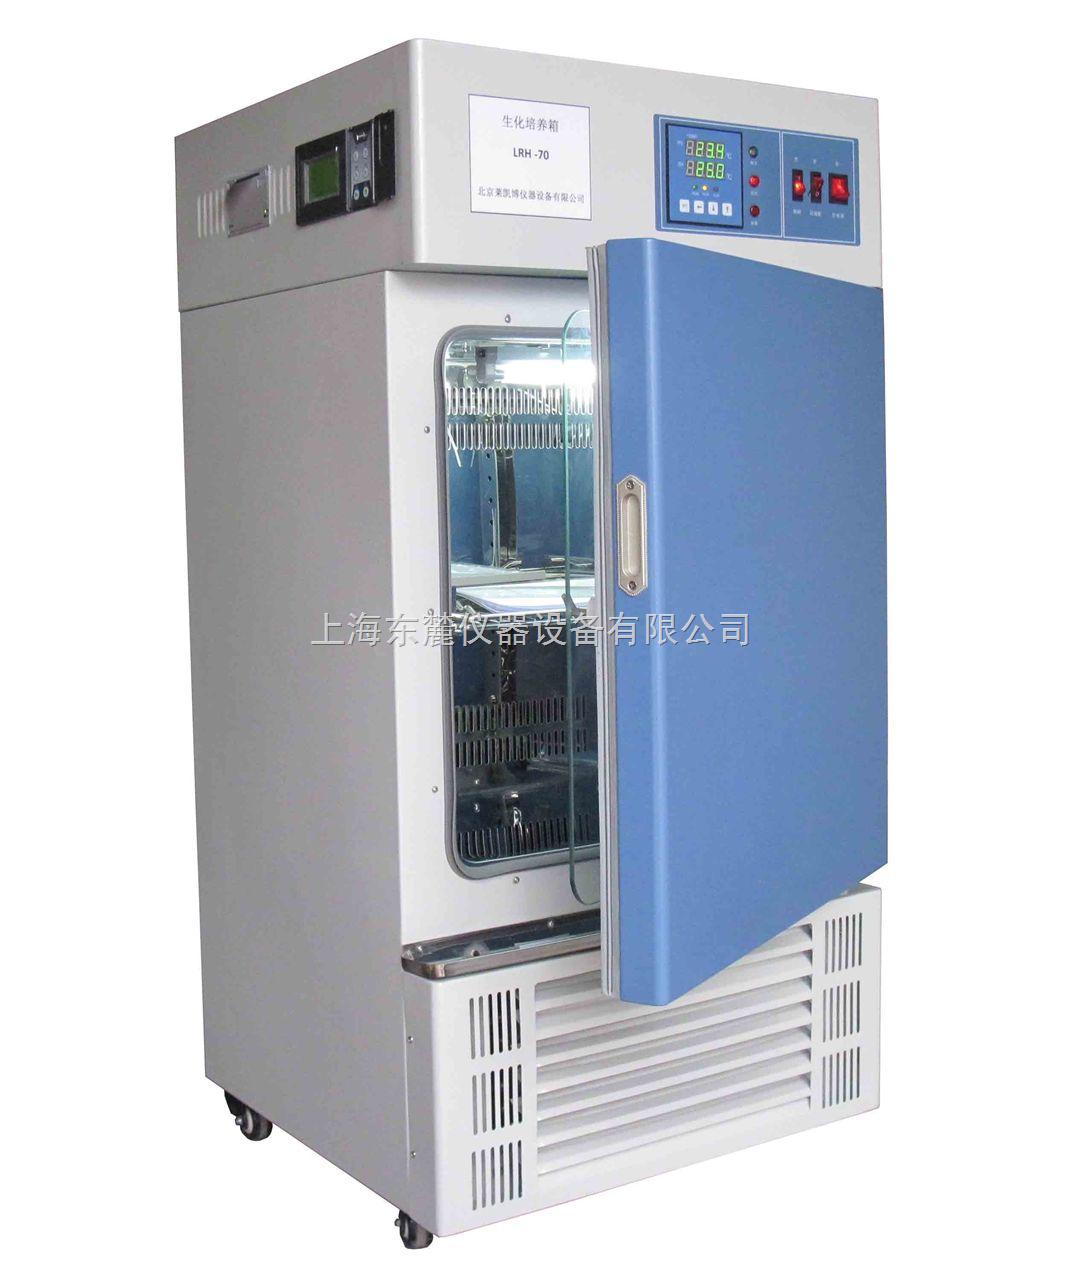 SPX-80-培養箱/生化培養箱/細菌培養箱